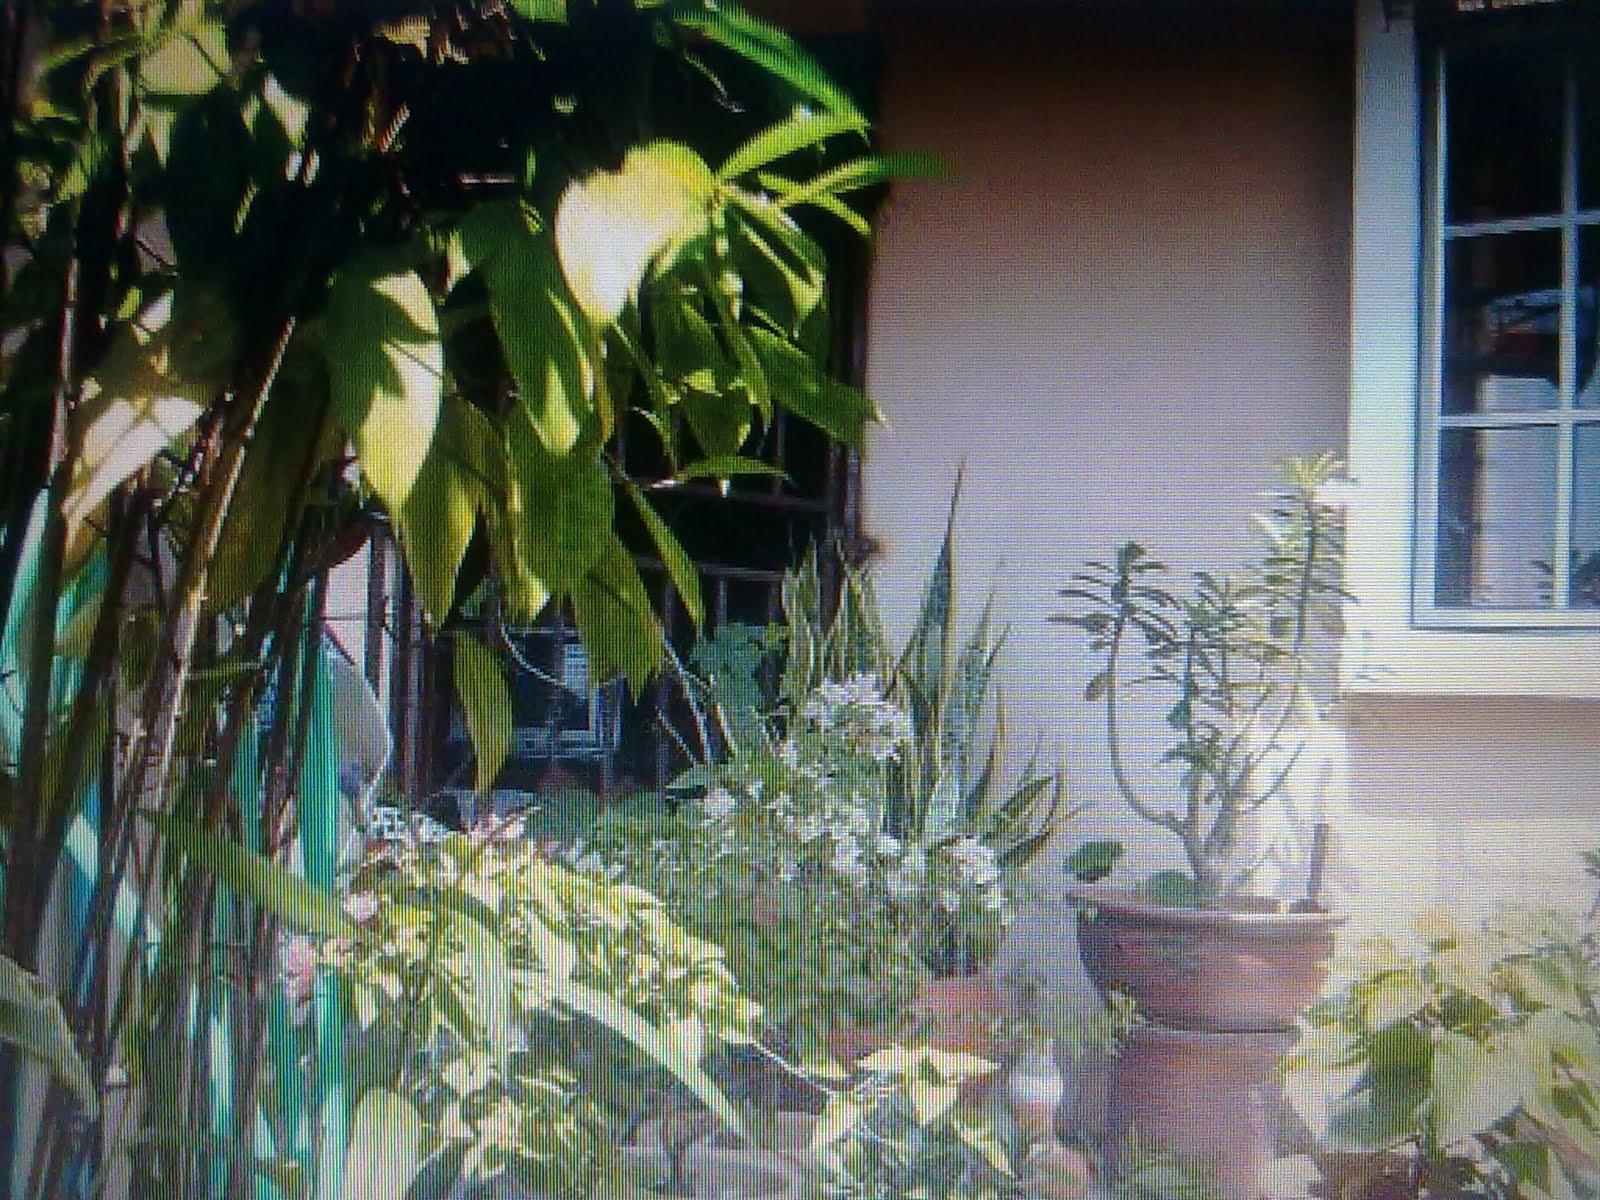 Property for sale single terrace house batu kawan for Terrace 9 classic penang